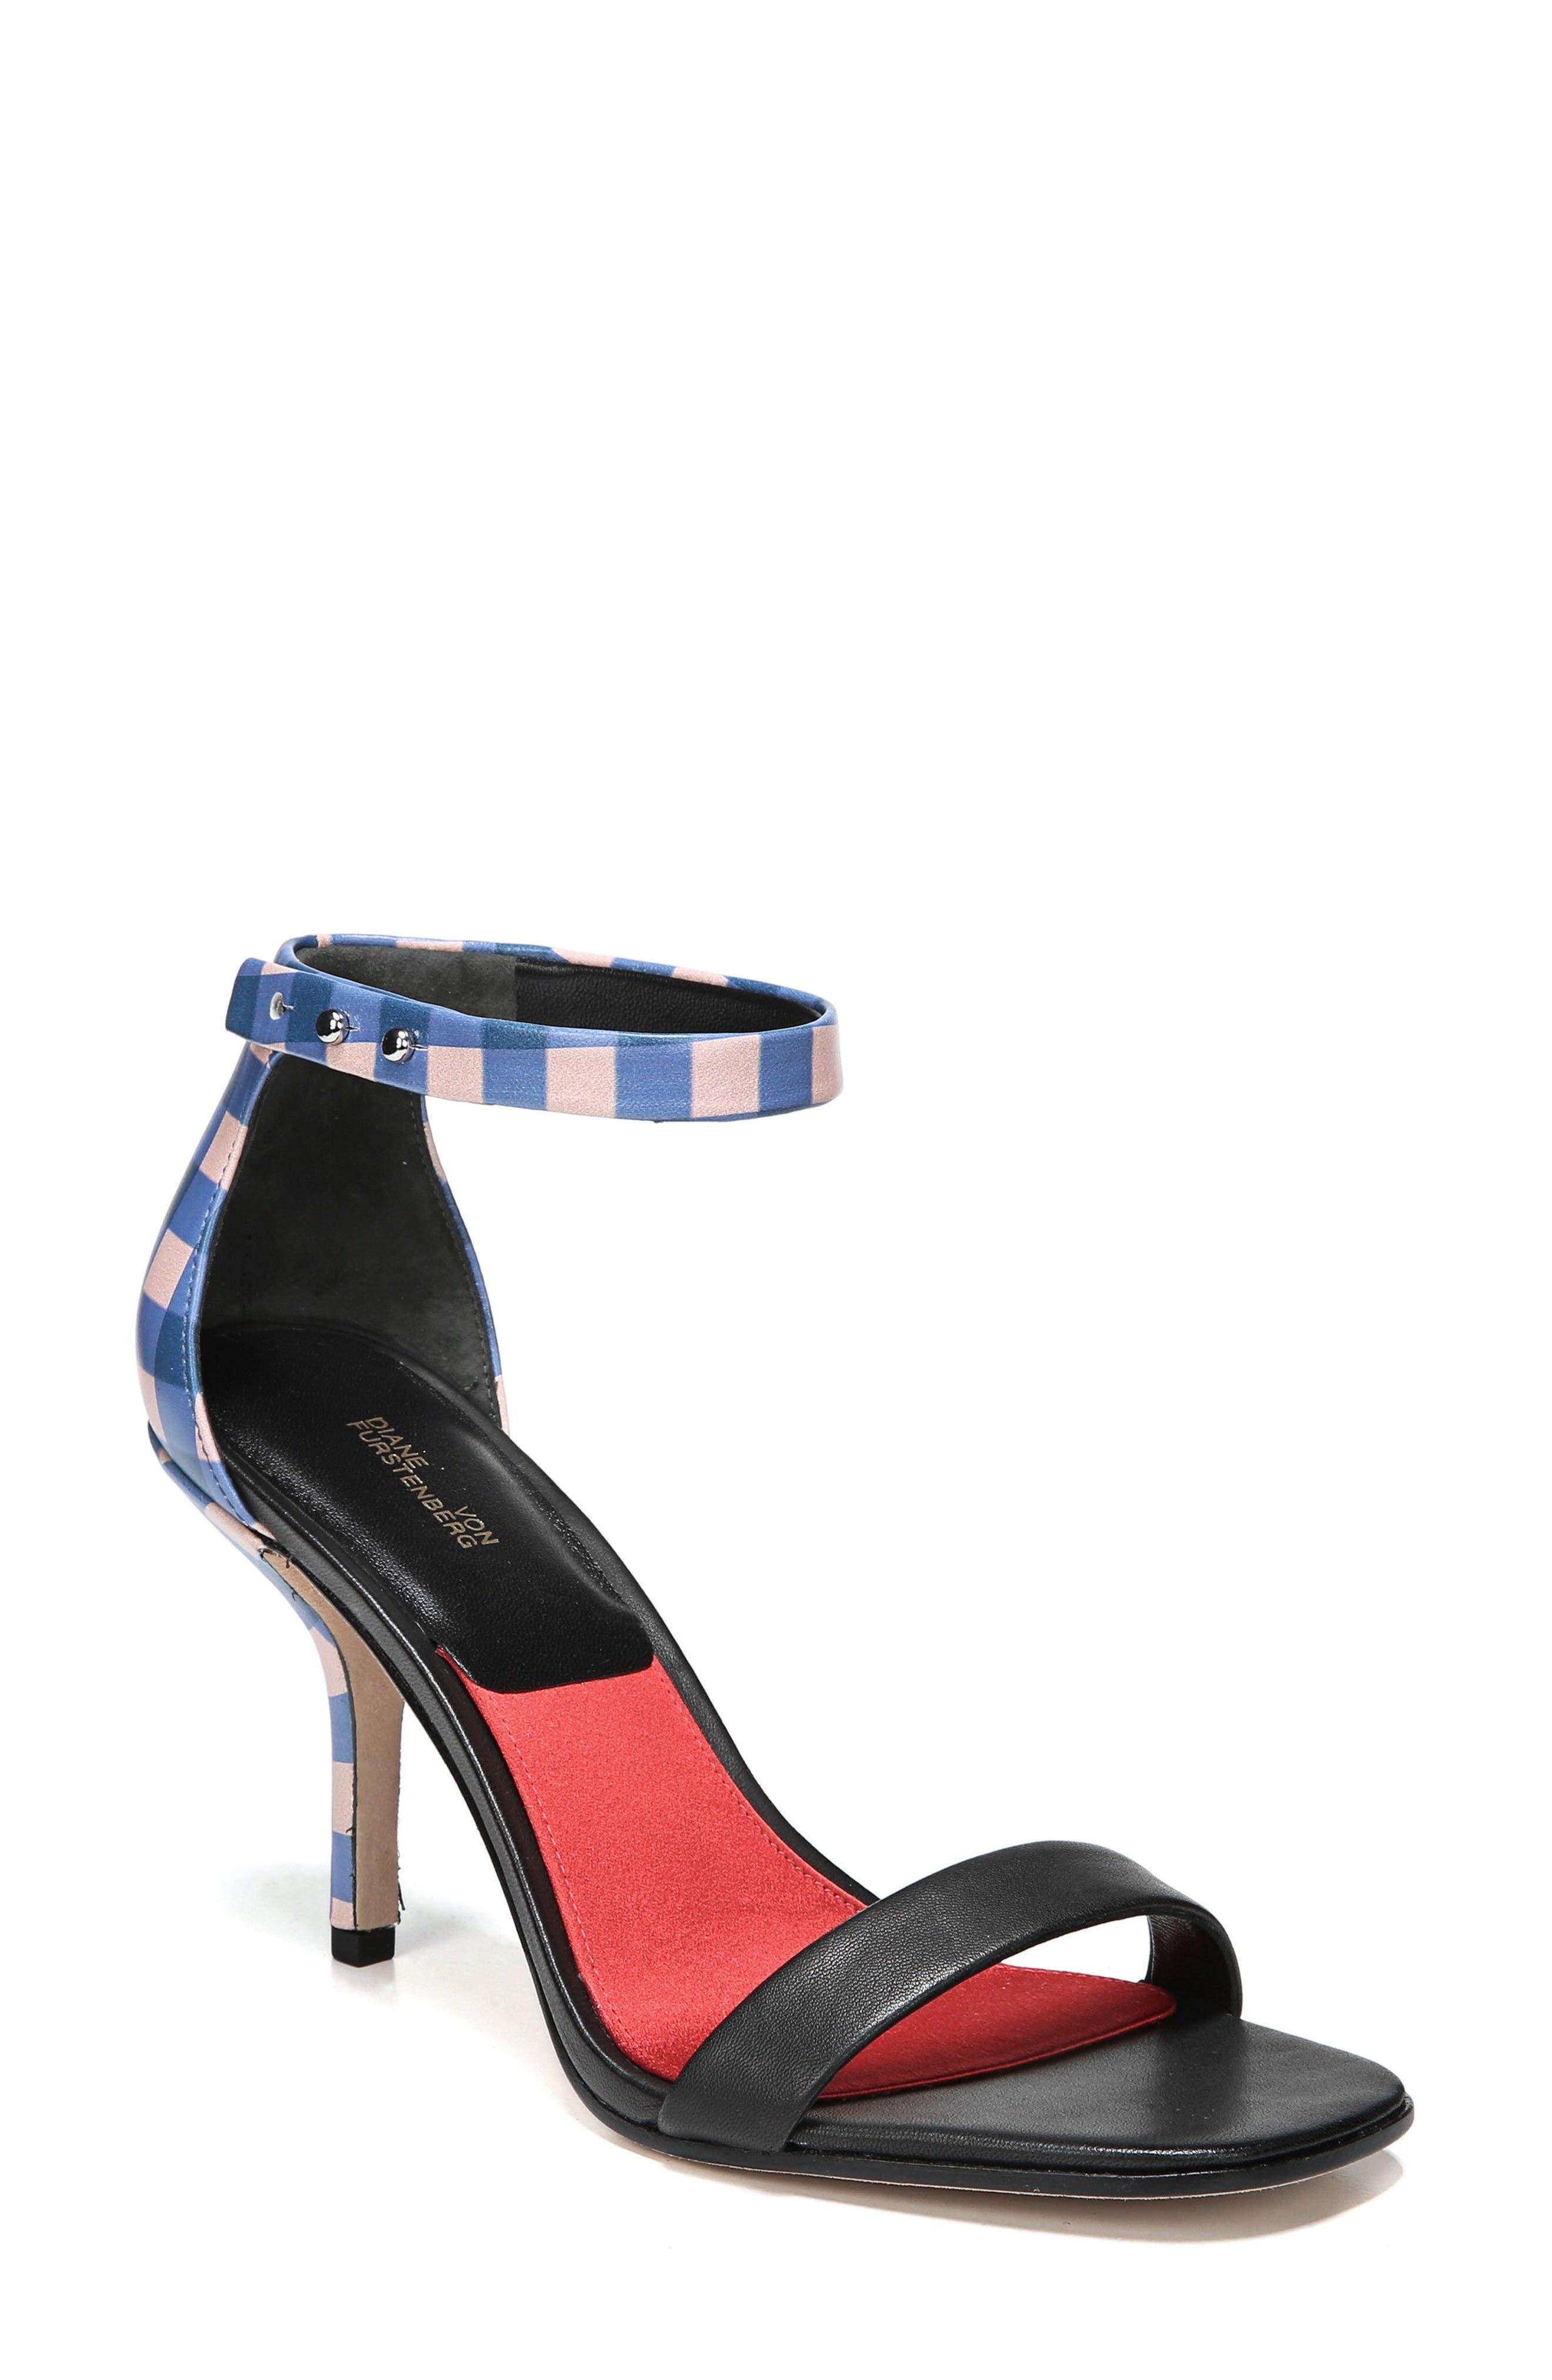 Main Image - Diane Von Furstenberg Ferrara Ankle Strap Sandal (Women)